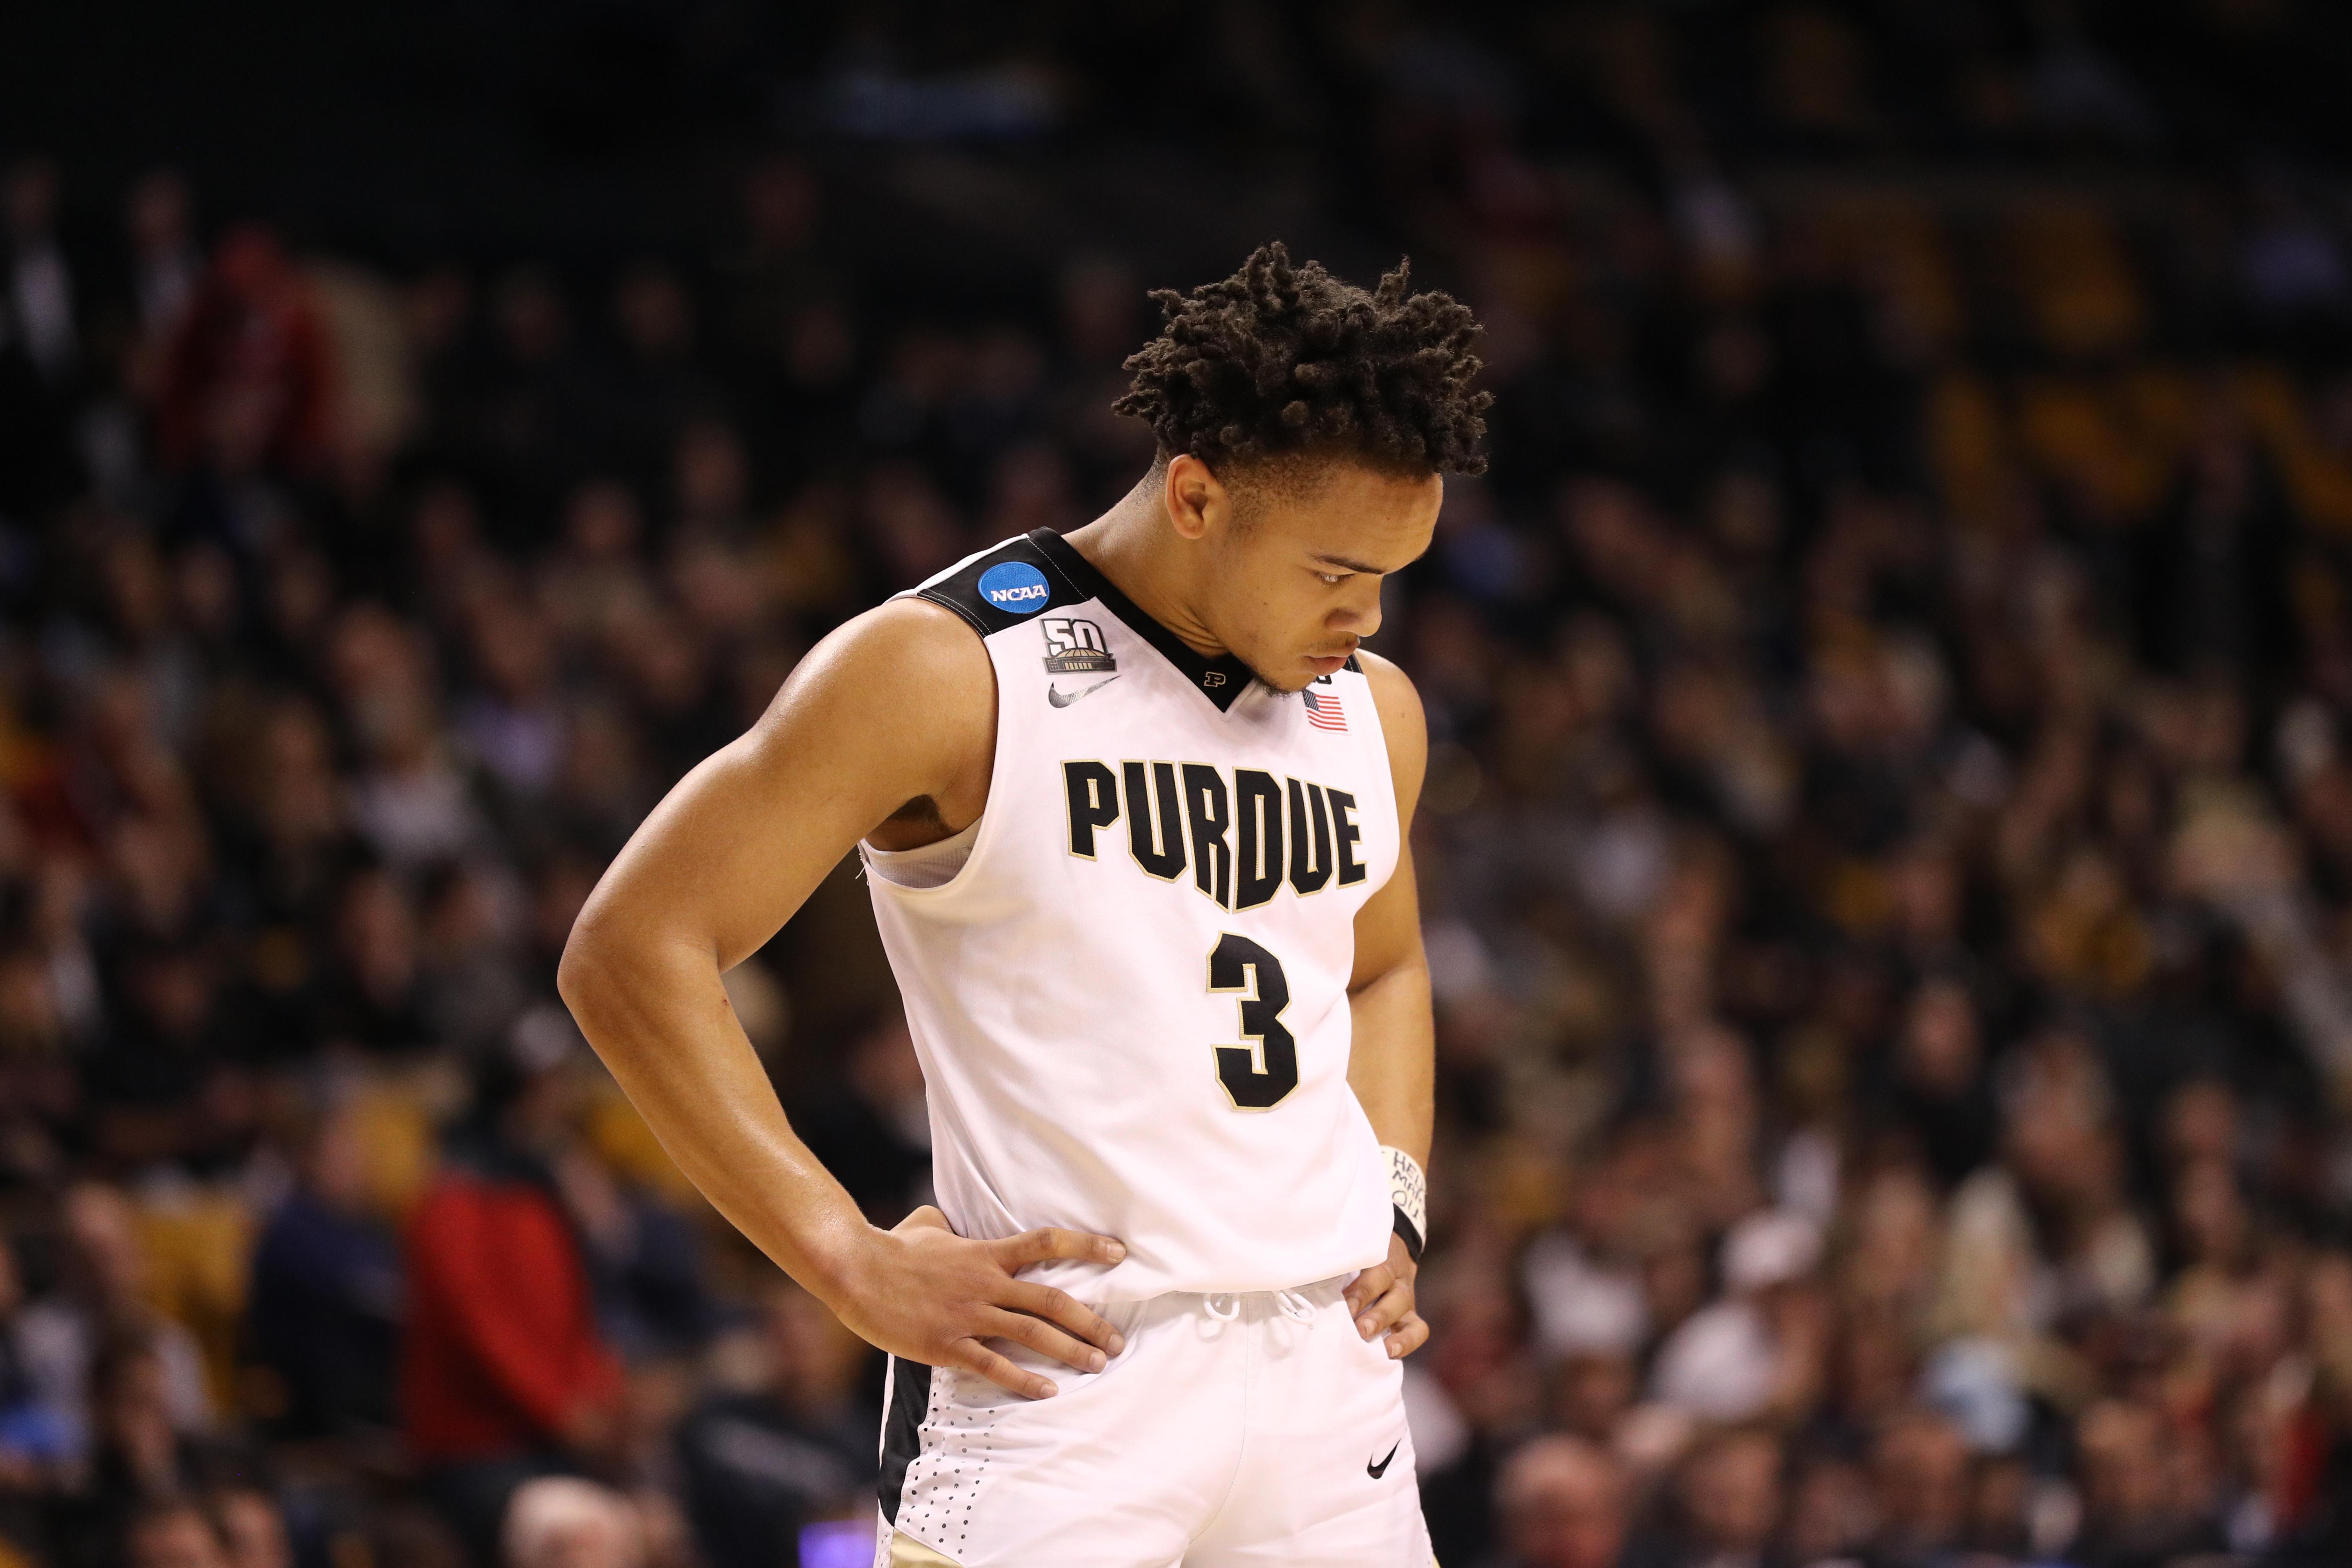 Purdue Basketball Warm Up Shirts